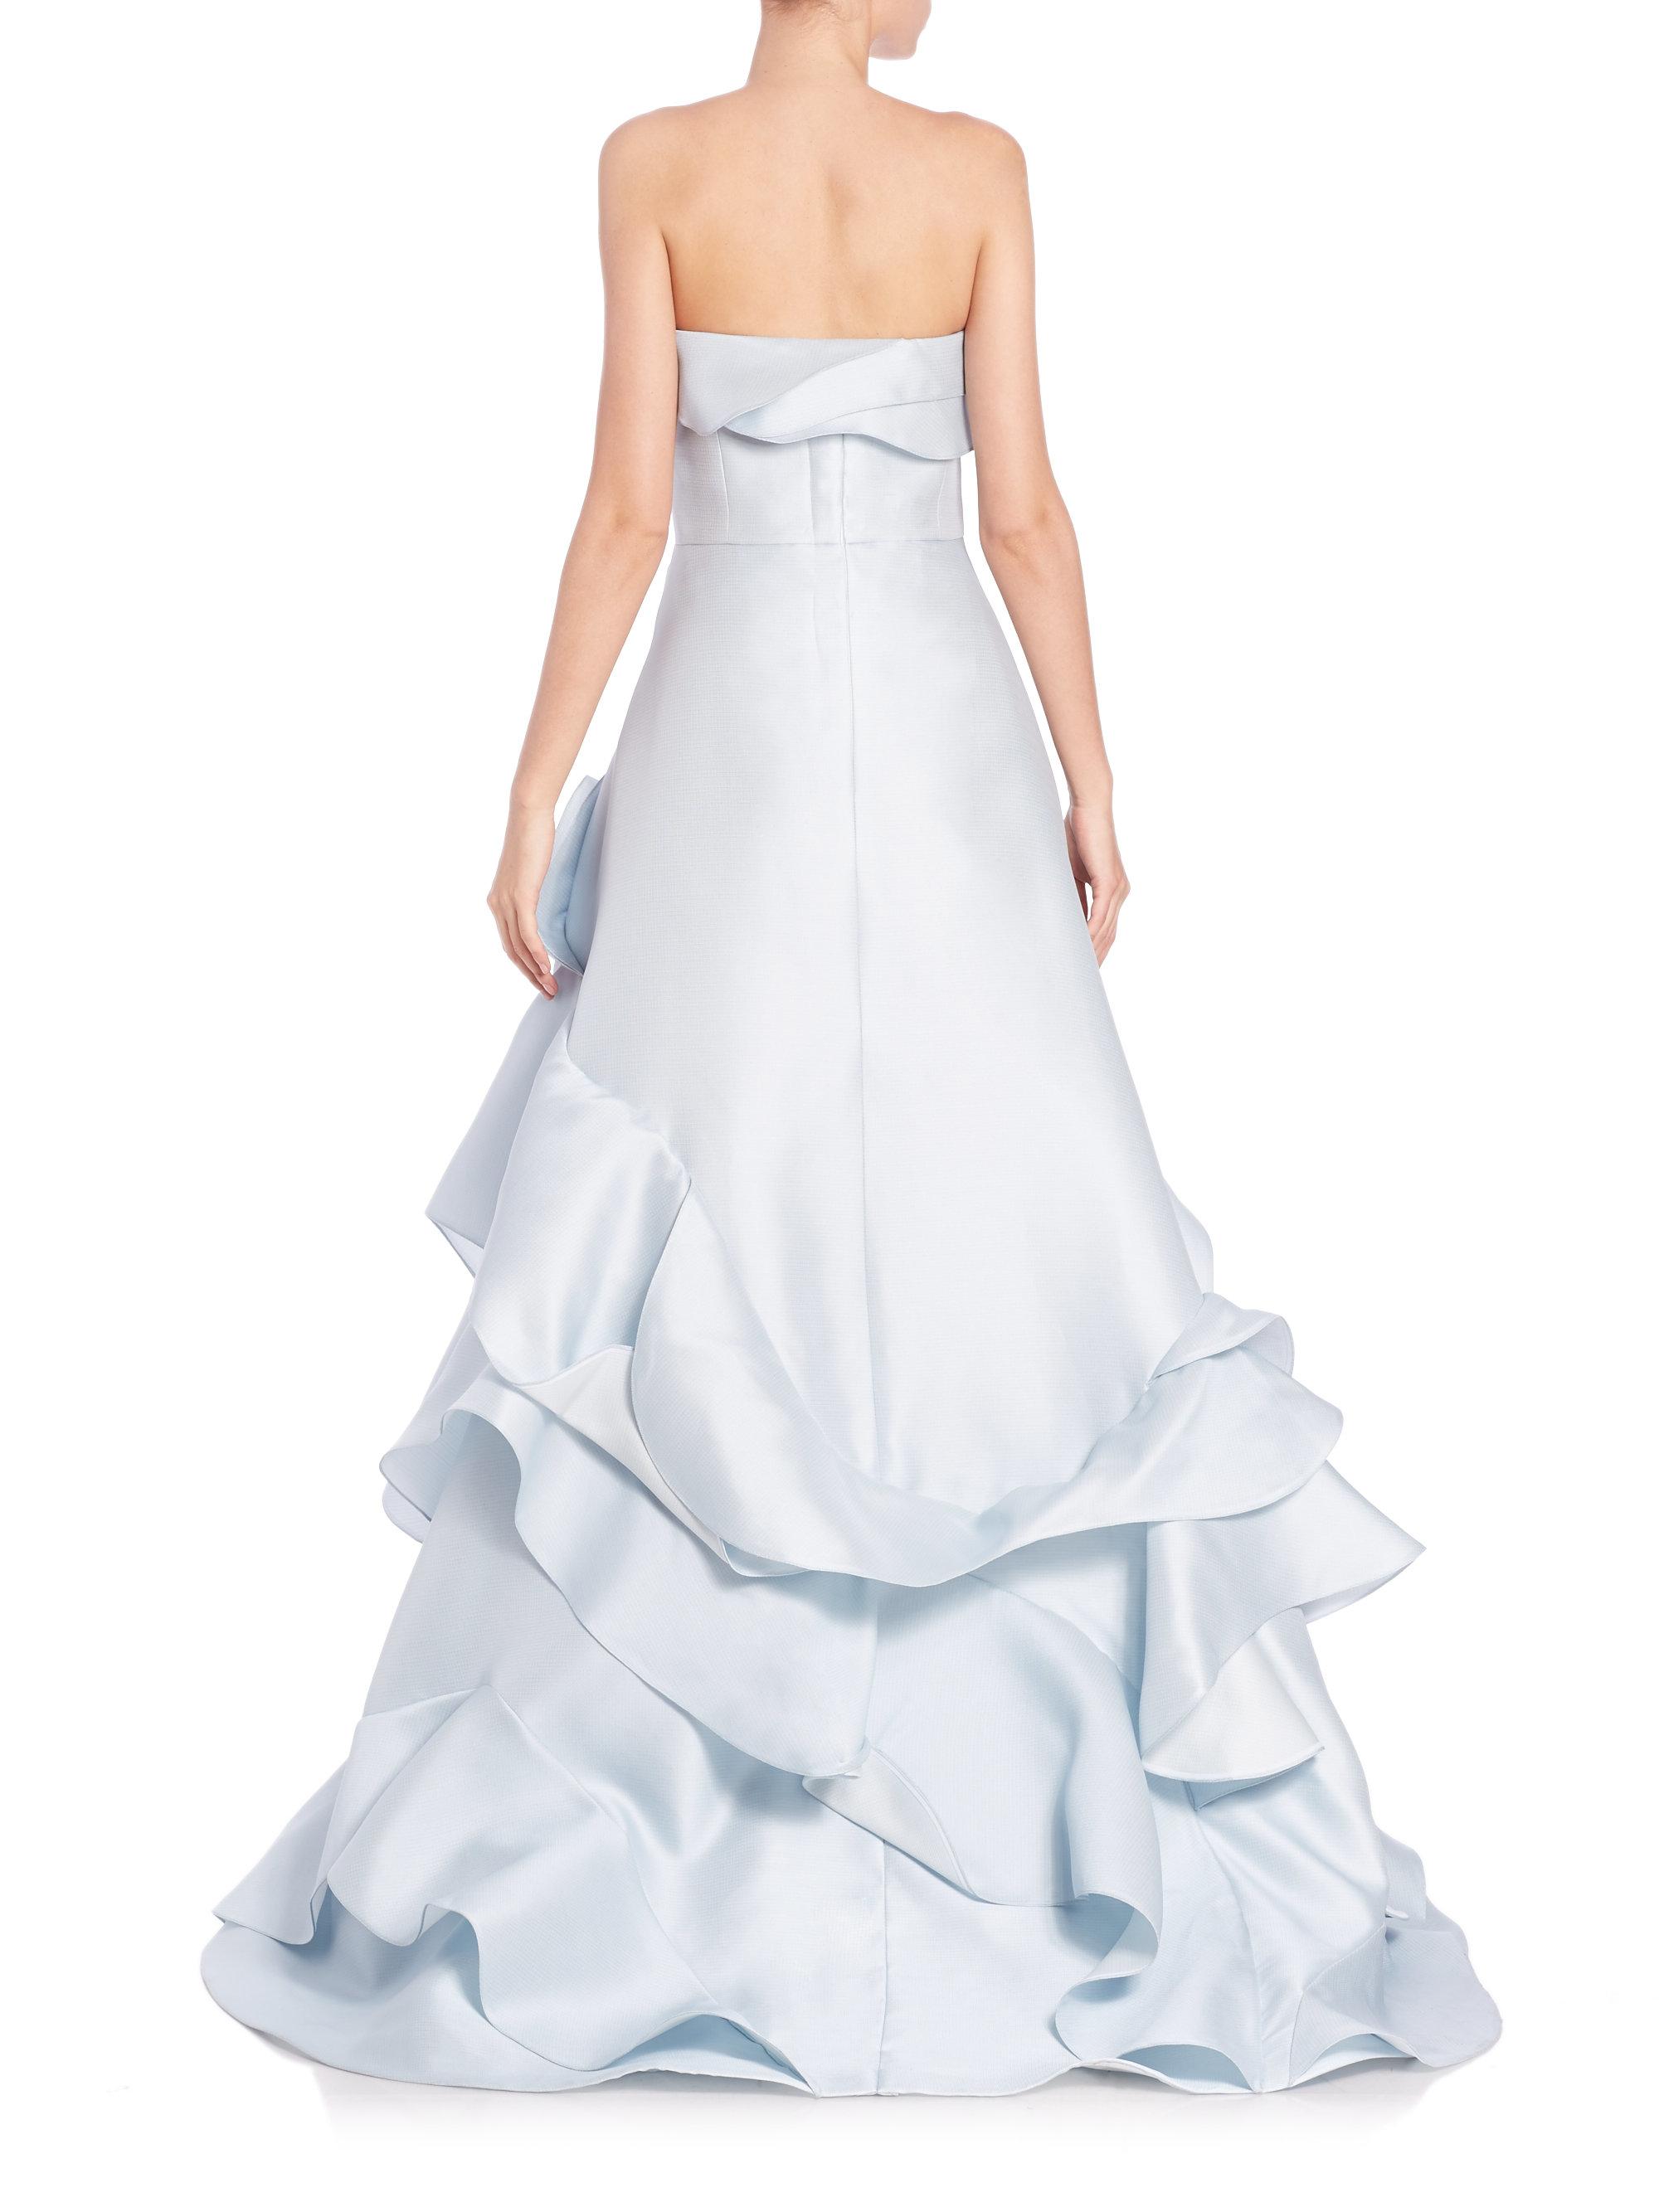 Lyst Carolina Herrera Strapless Ruffled Ball Gown In Blue